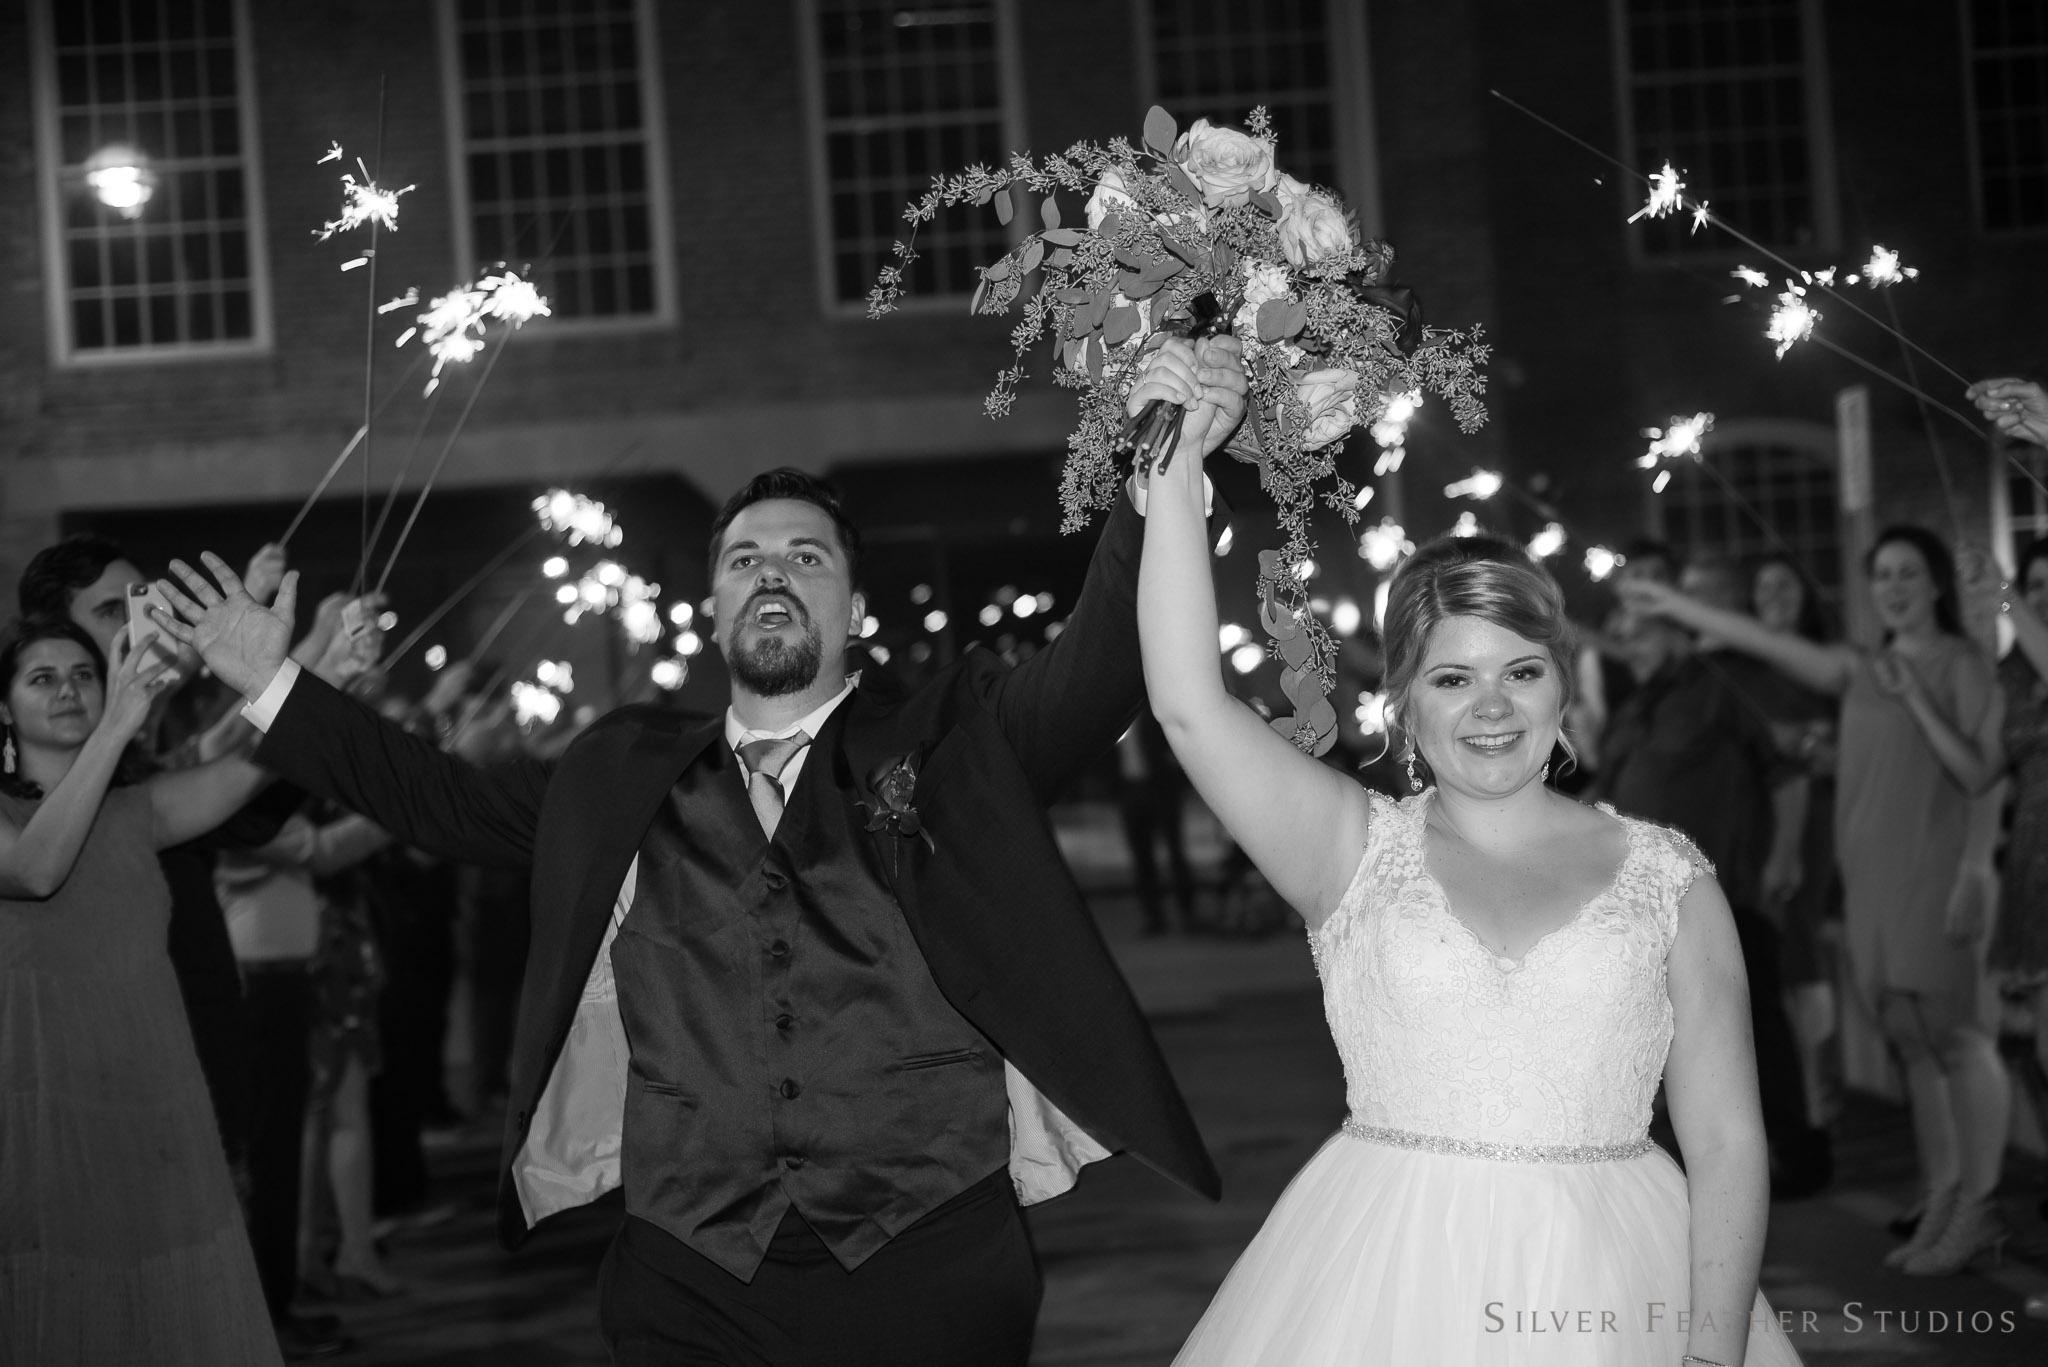 cottom-room-wedding-photography-053.jpg